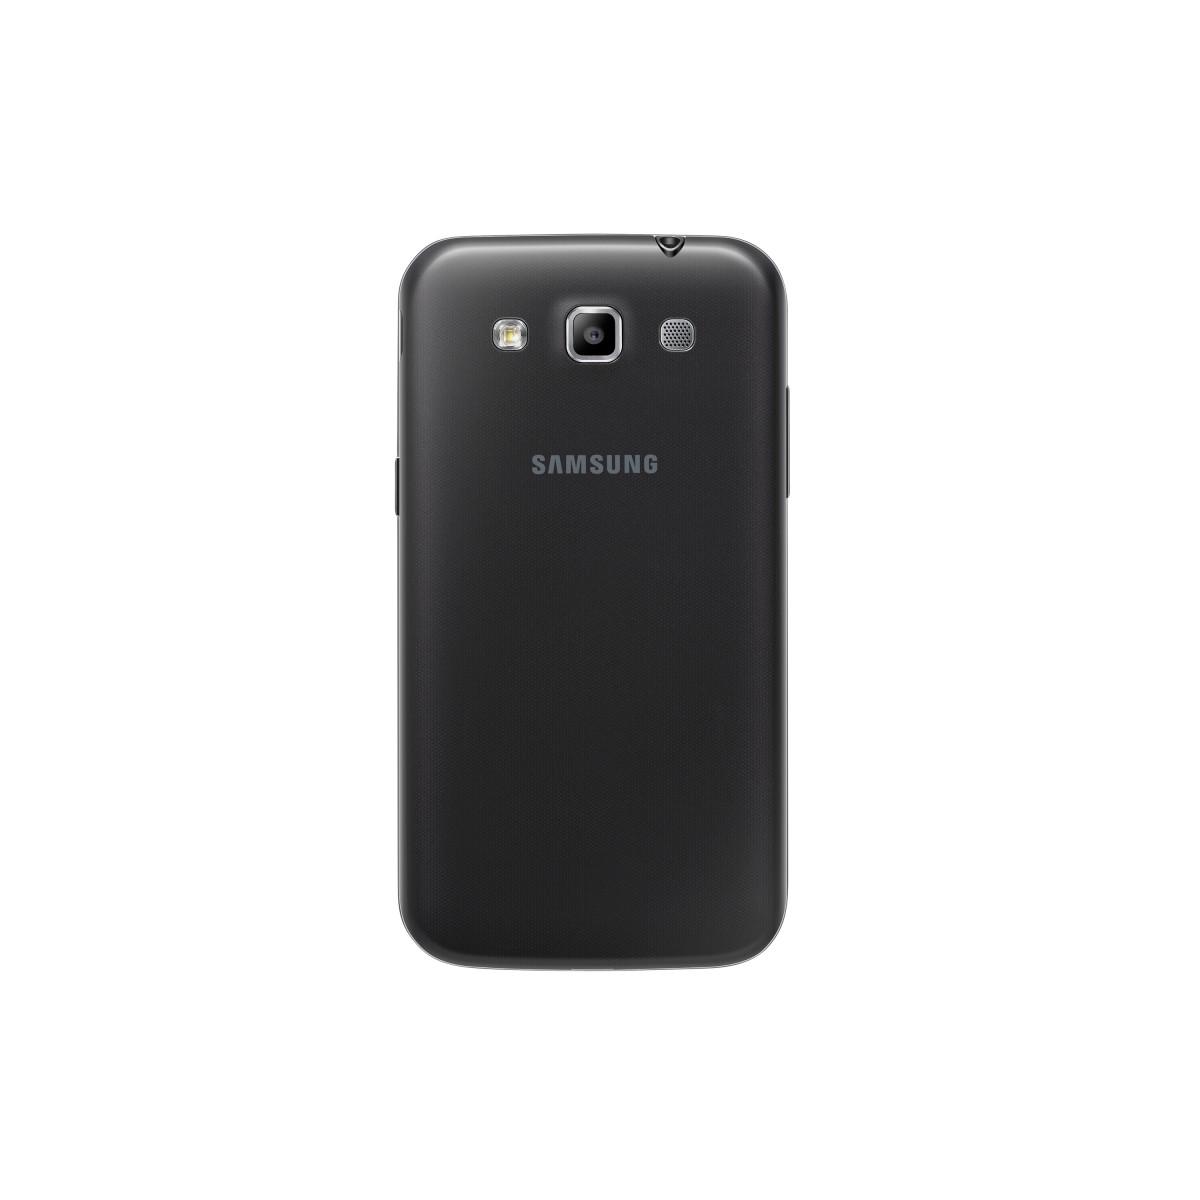 Smartphone Desbloqueado GT-I8552B Galaxy Win Duos Cinza com Dual Chip, Tela de 4.7, Android 4.1, Processador Quad Core